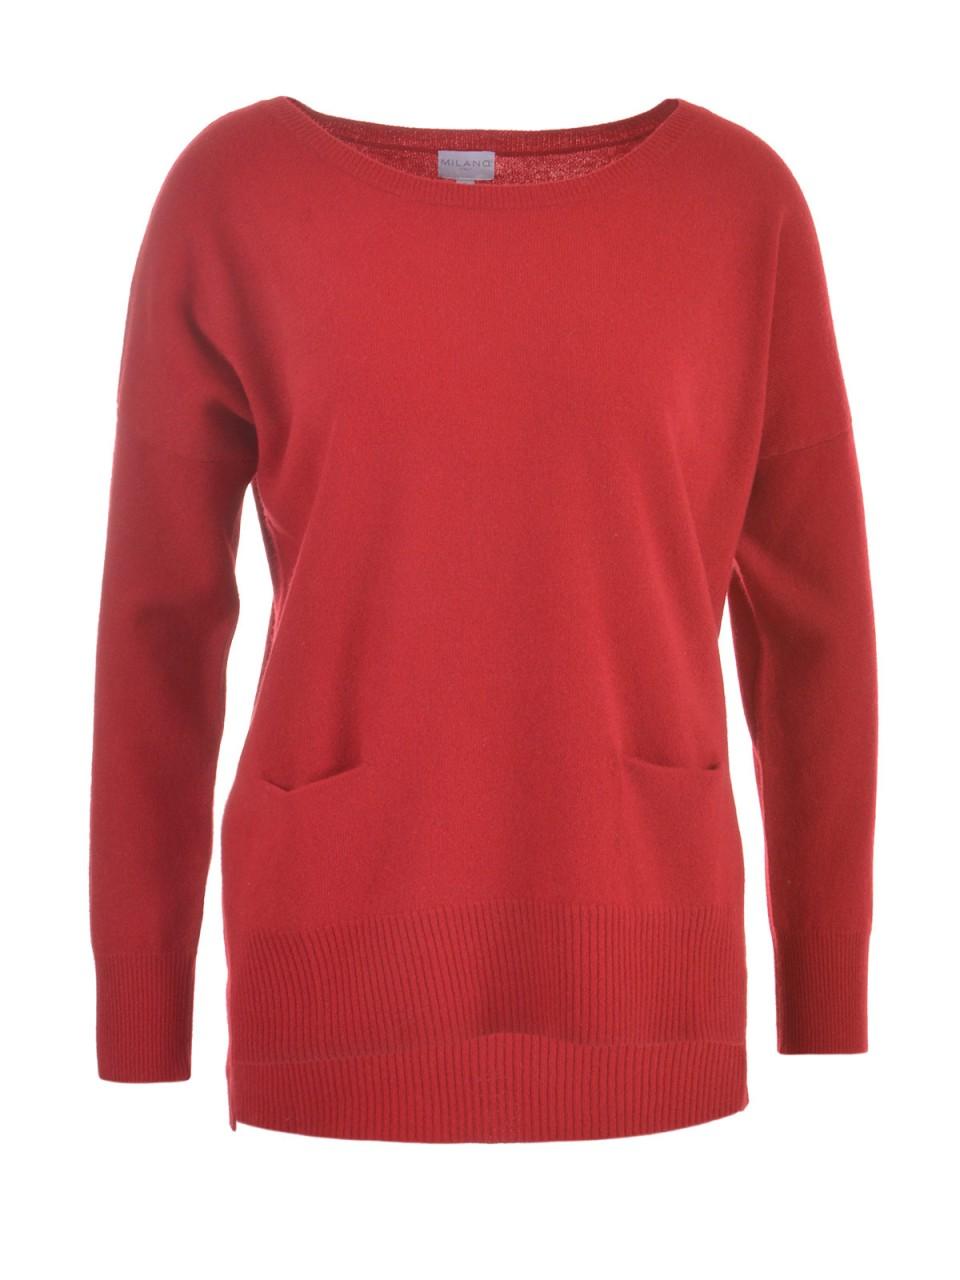 milano-italy-damen-pullover-rot